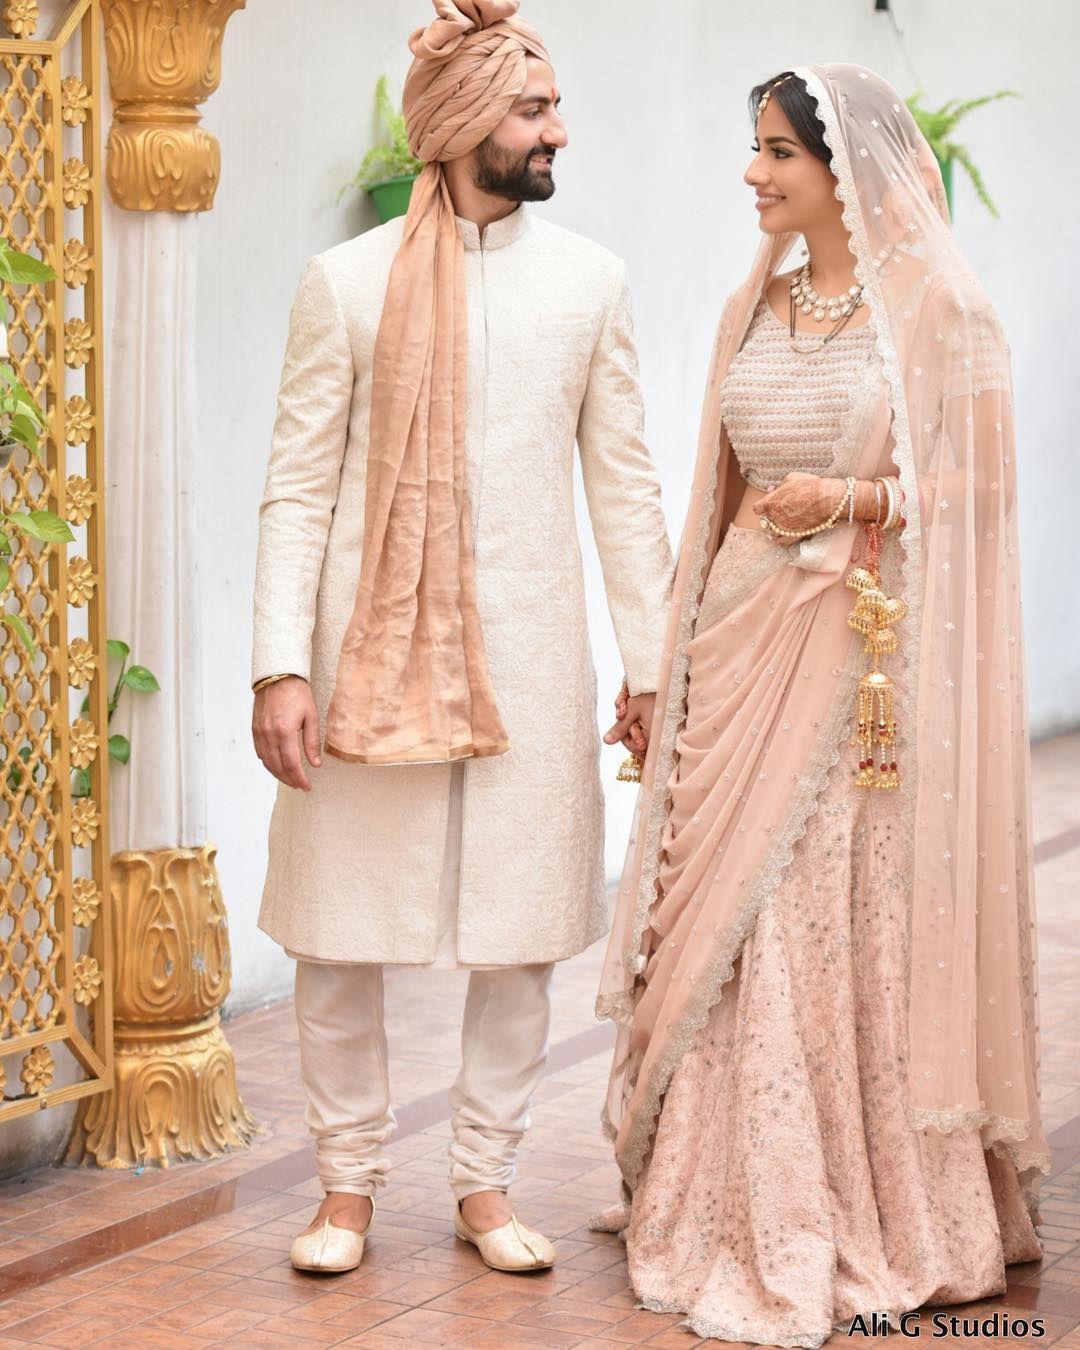 d2c12b6133 #shaadiwish #indianweddings #indianbride  #bridallehenga#offbeatbridallehenga #bridaljewellery #coupleportrait  #pastellehenga #colourcoordinatedoutfits